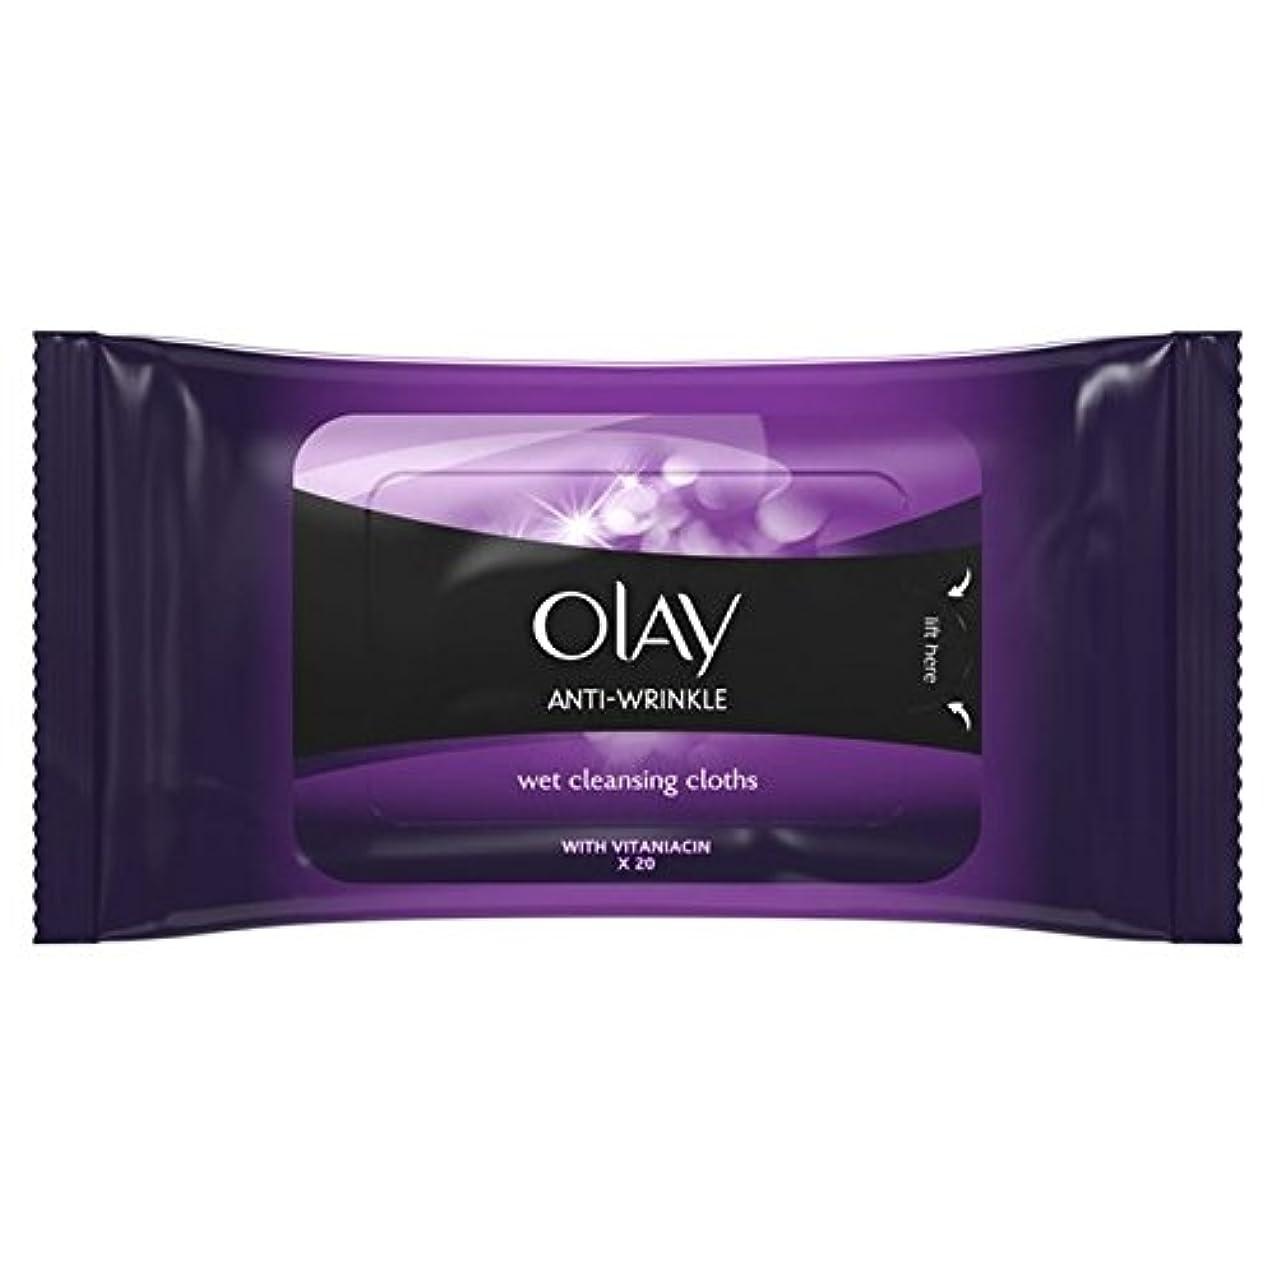 Olay Anti Wrinkle Firm & Lift Wet Cleansing Wipes 20 per pack - パックごとに20ワイプ抗シワ事務所をオーレイ&湿ったクレンジングを持ち上げます [並行輸入品]